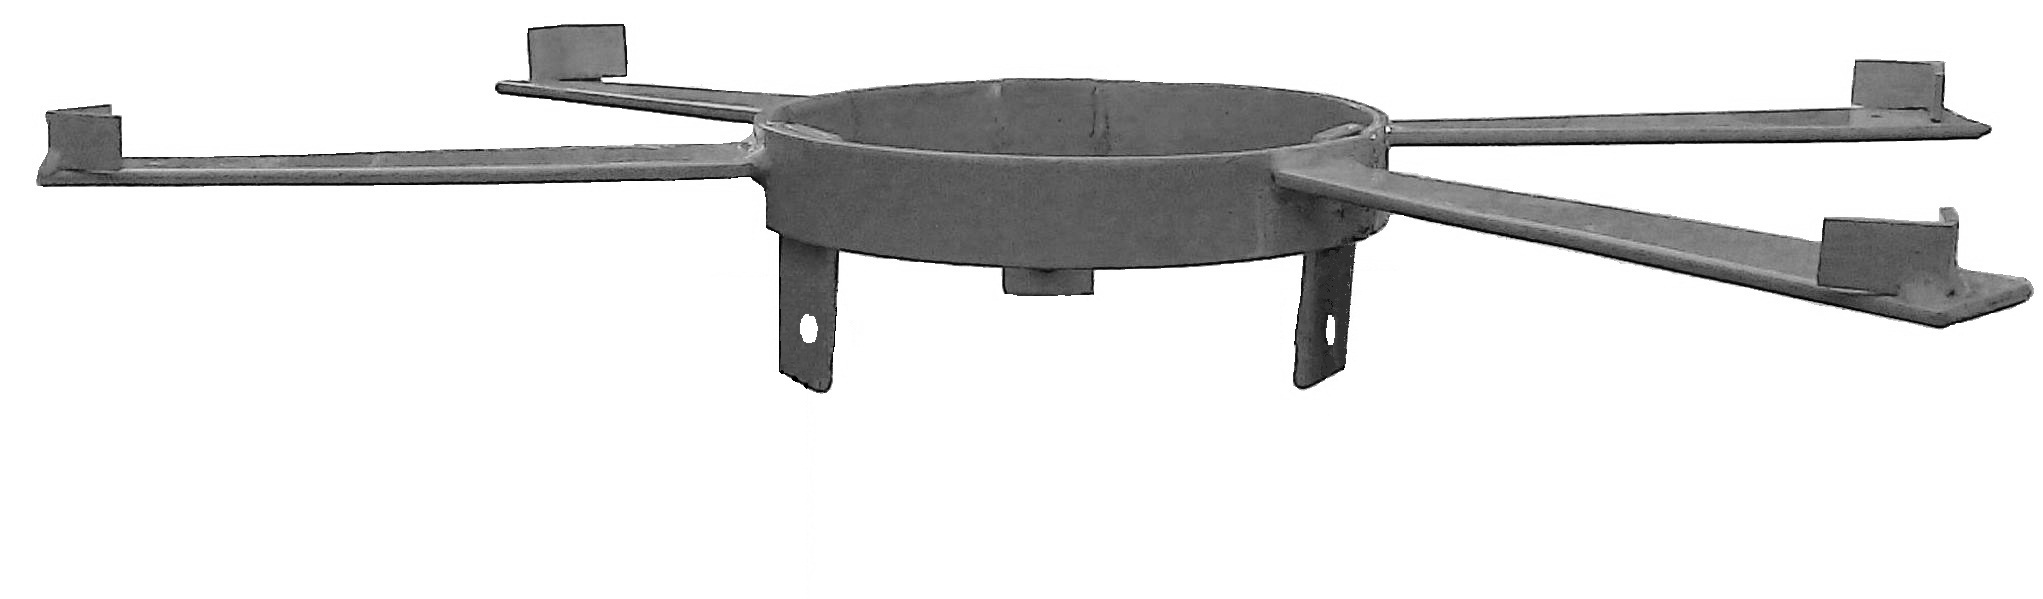 Корона для установки будки Селянинова на асбоцементную трубу